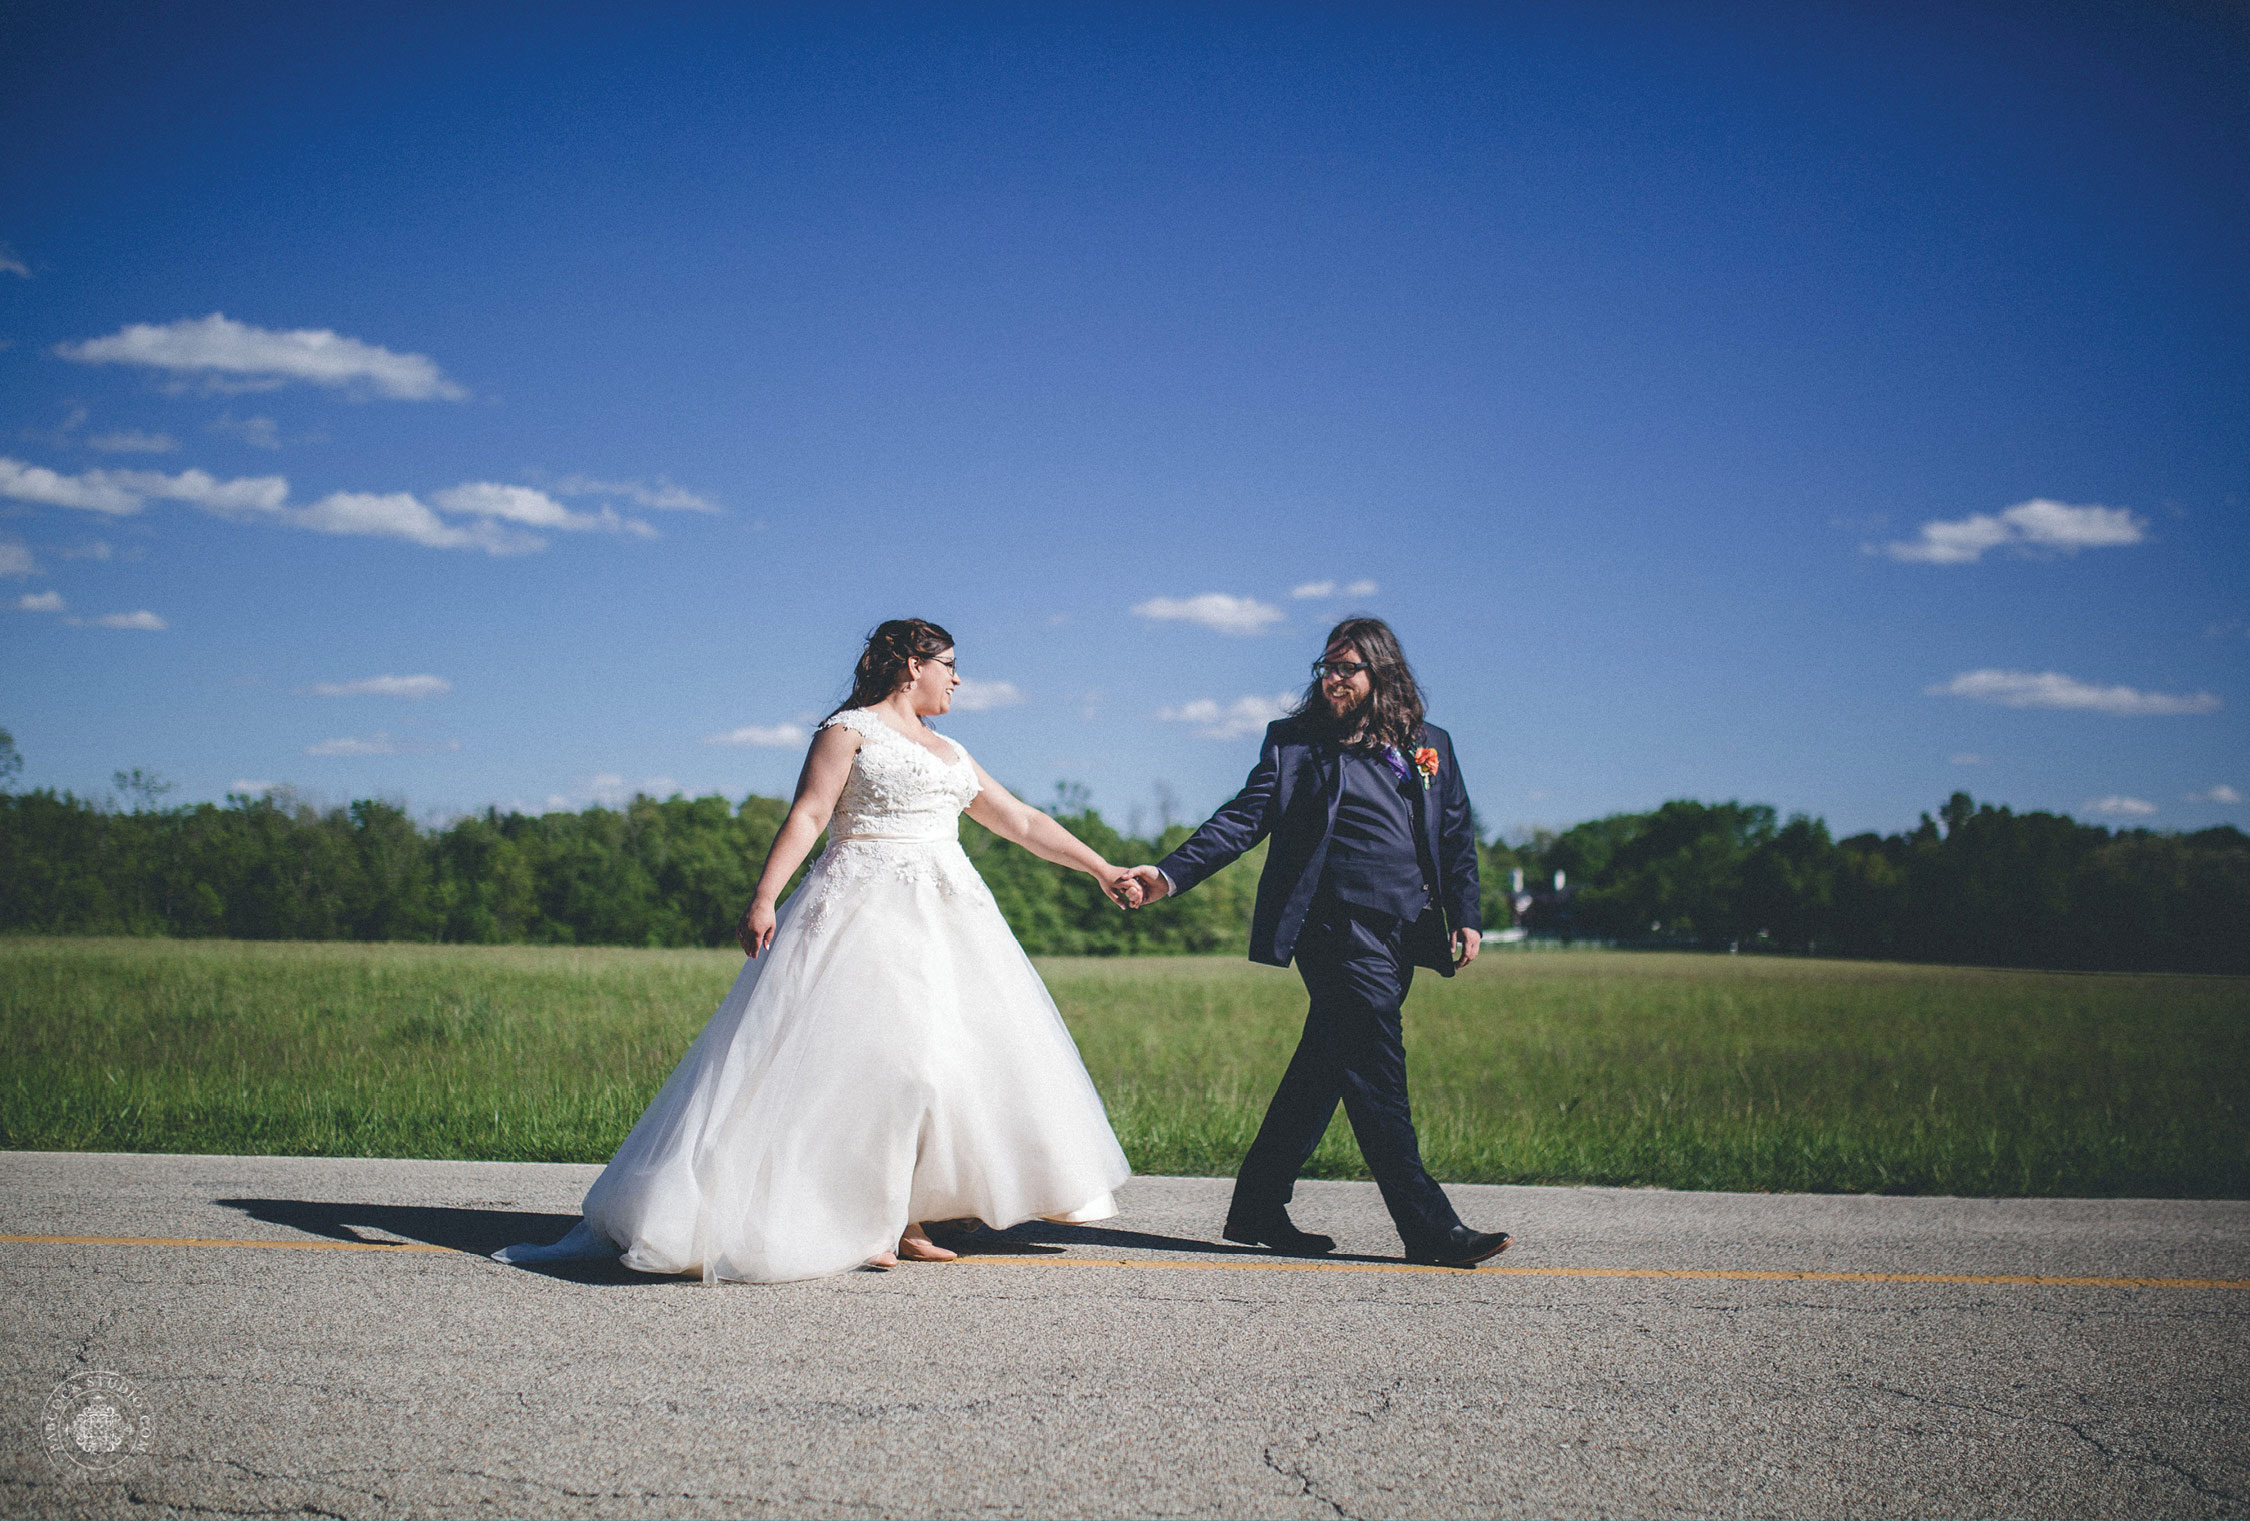 nicole-brendarn-school-house-wedding-photographer-dayton-ohio-26.jpg